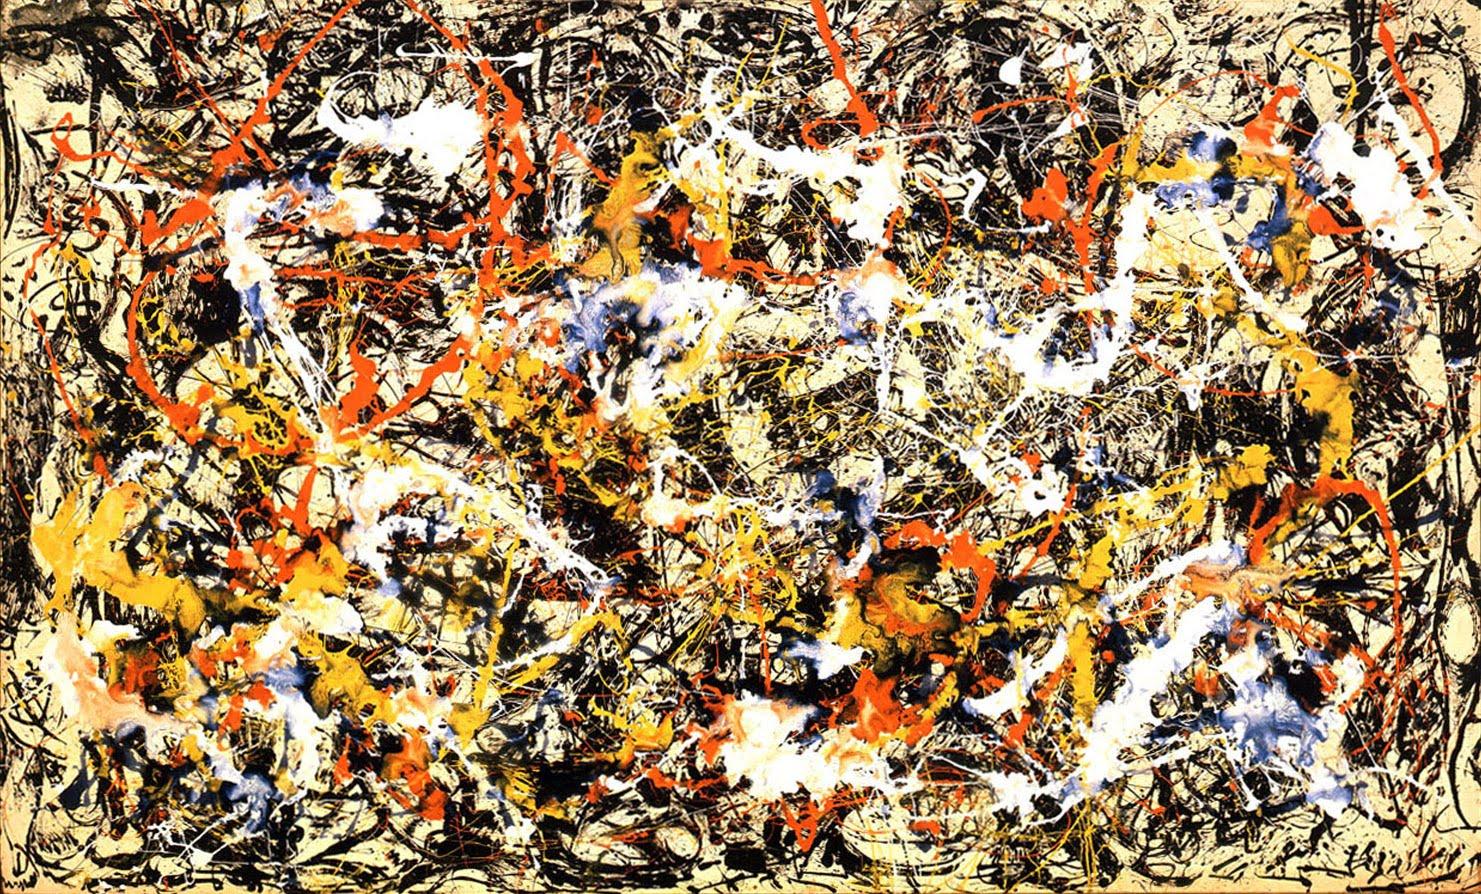 qi in modern art vincent van gogh and jackson pollock convergence 3 bp pot com